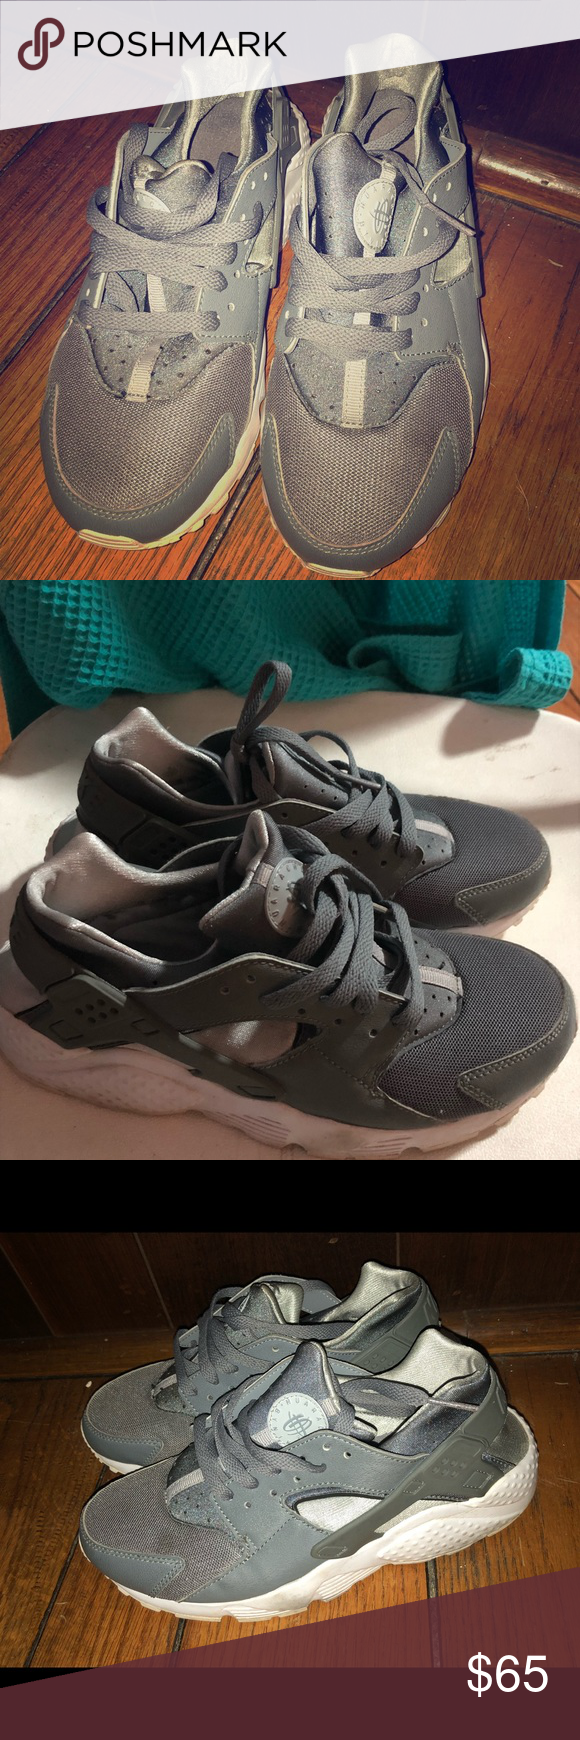 49f69894431 Teva Omnium 2 Leather Walking Sandal (Men s) NWT